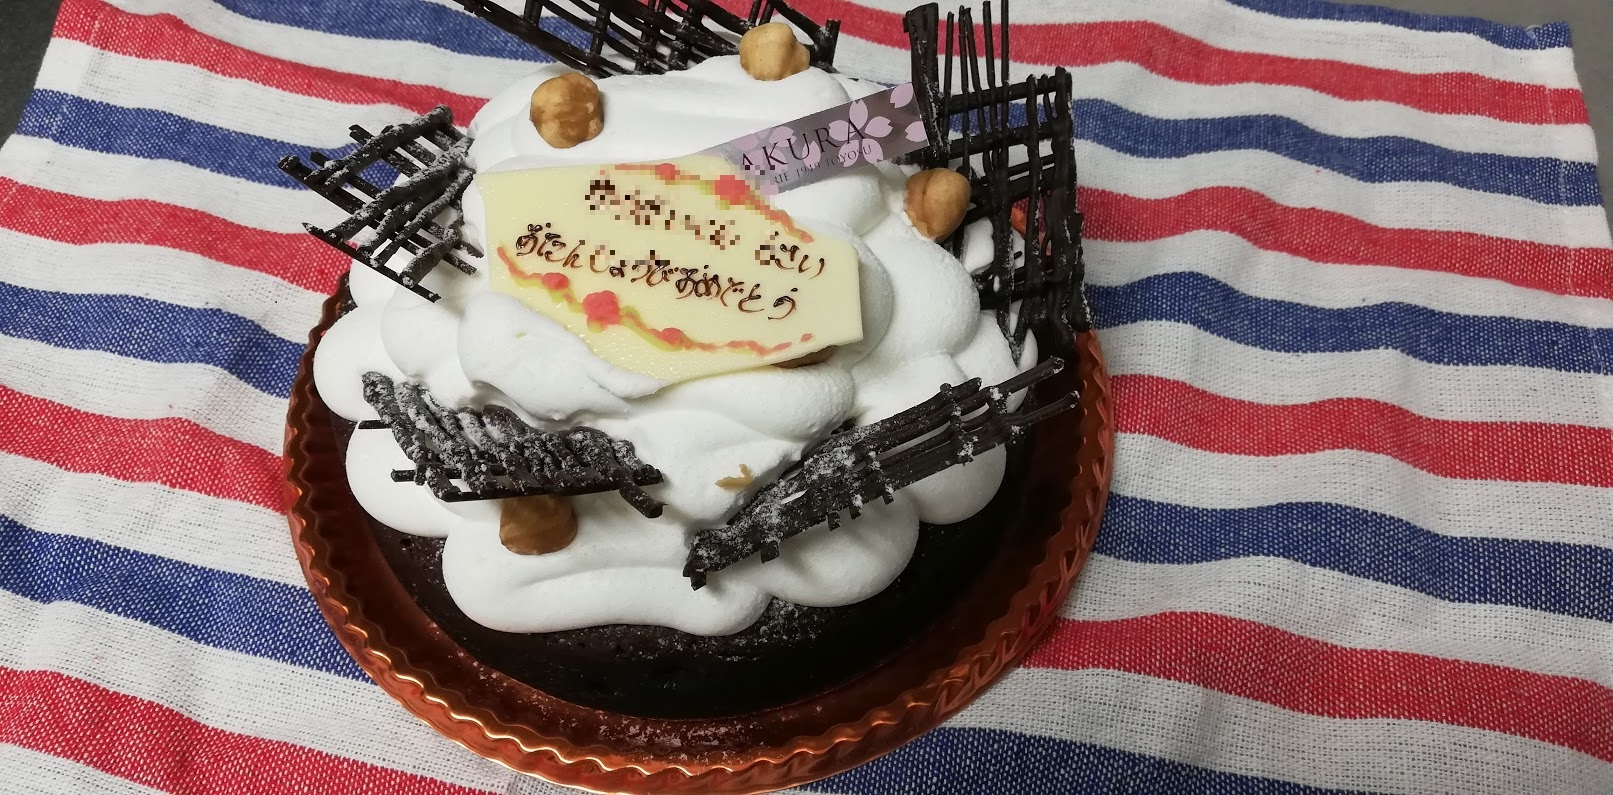 SAKURAのホールのチョコレートケーキ